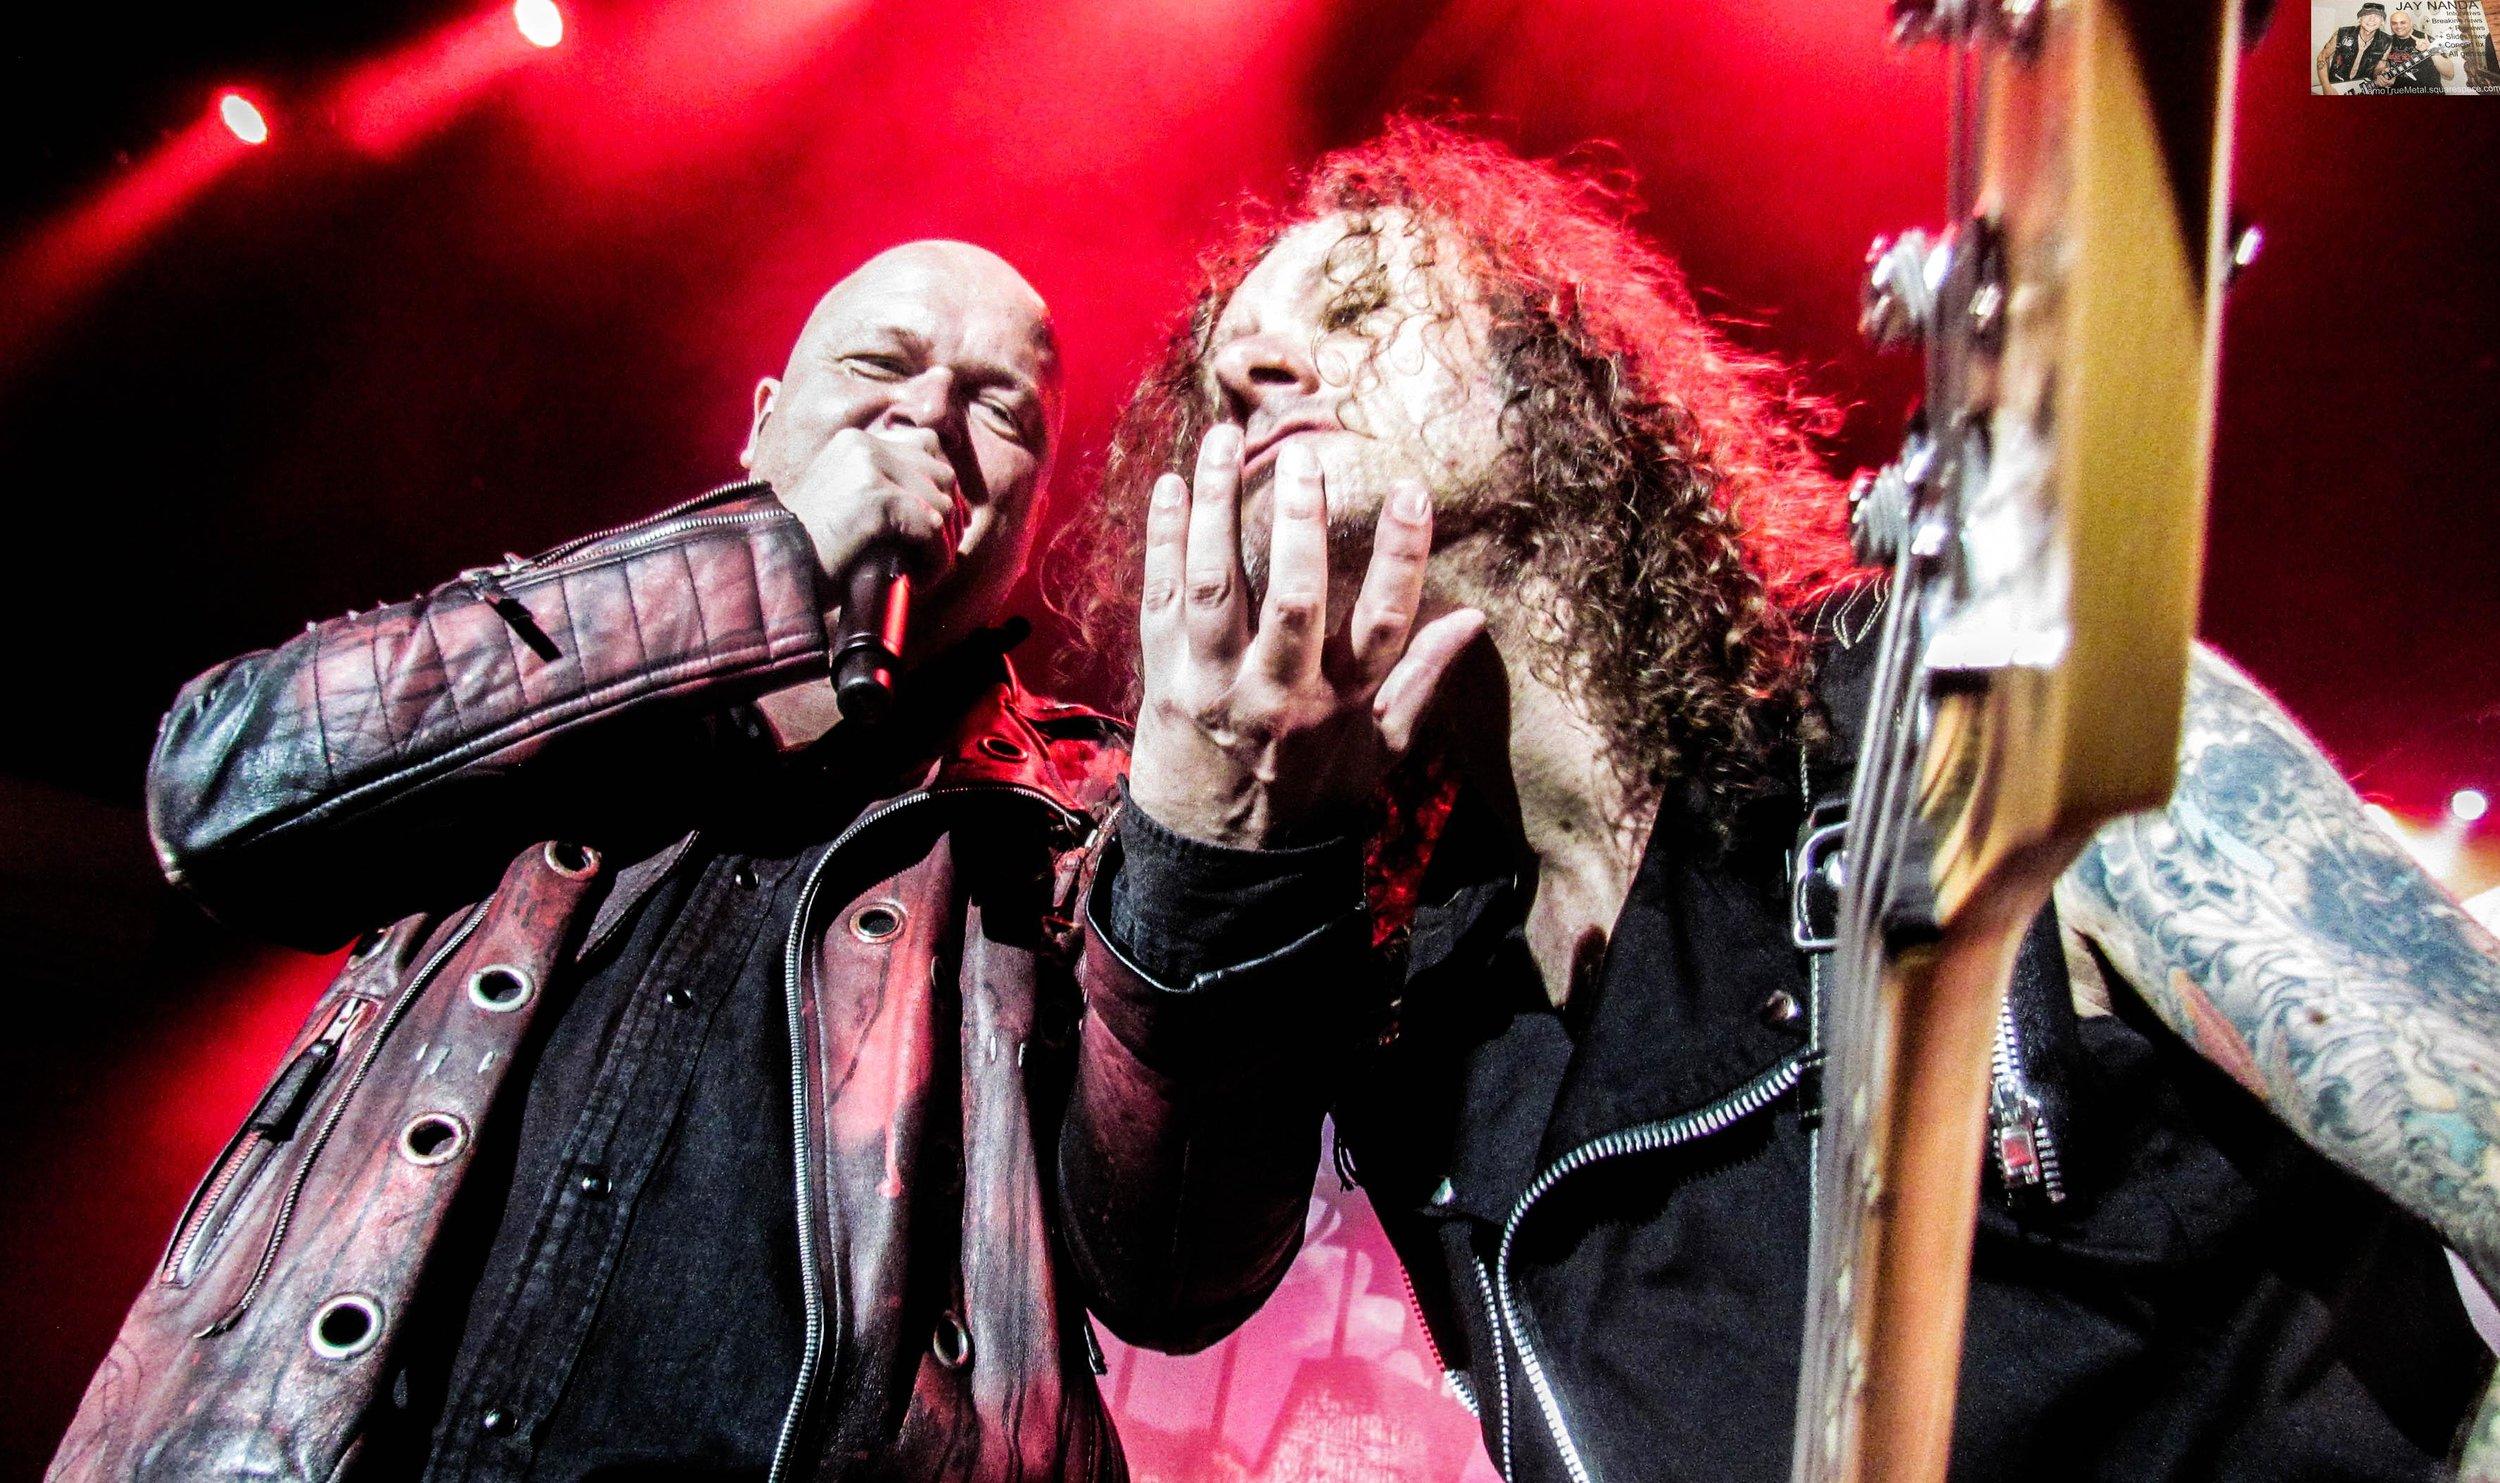 Kiske has fun with his late-'80s bandmate and former nemesis Grosskopf.